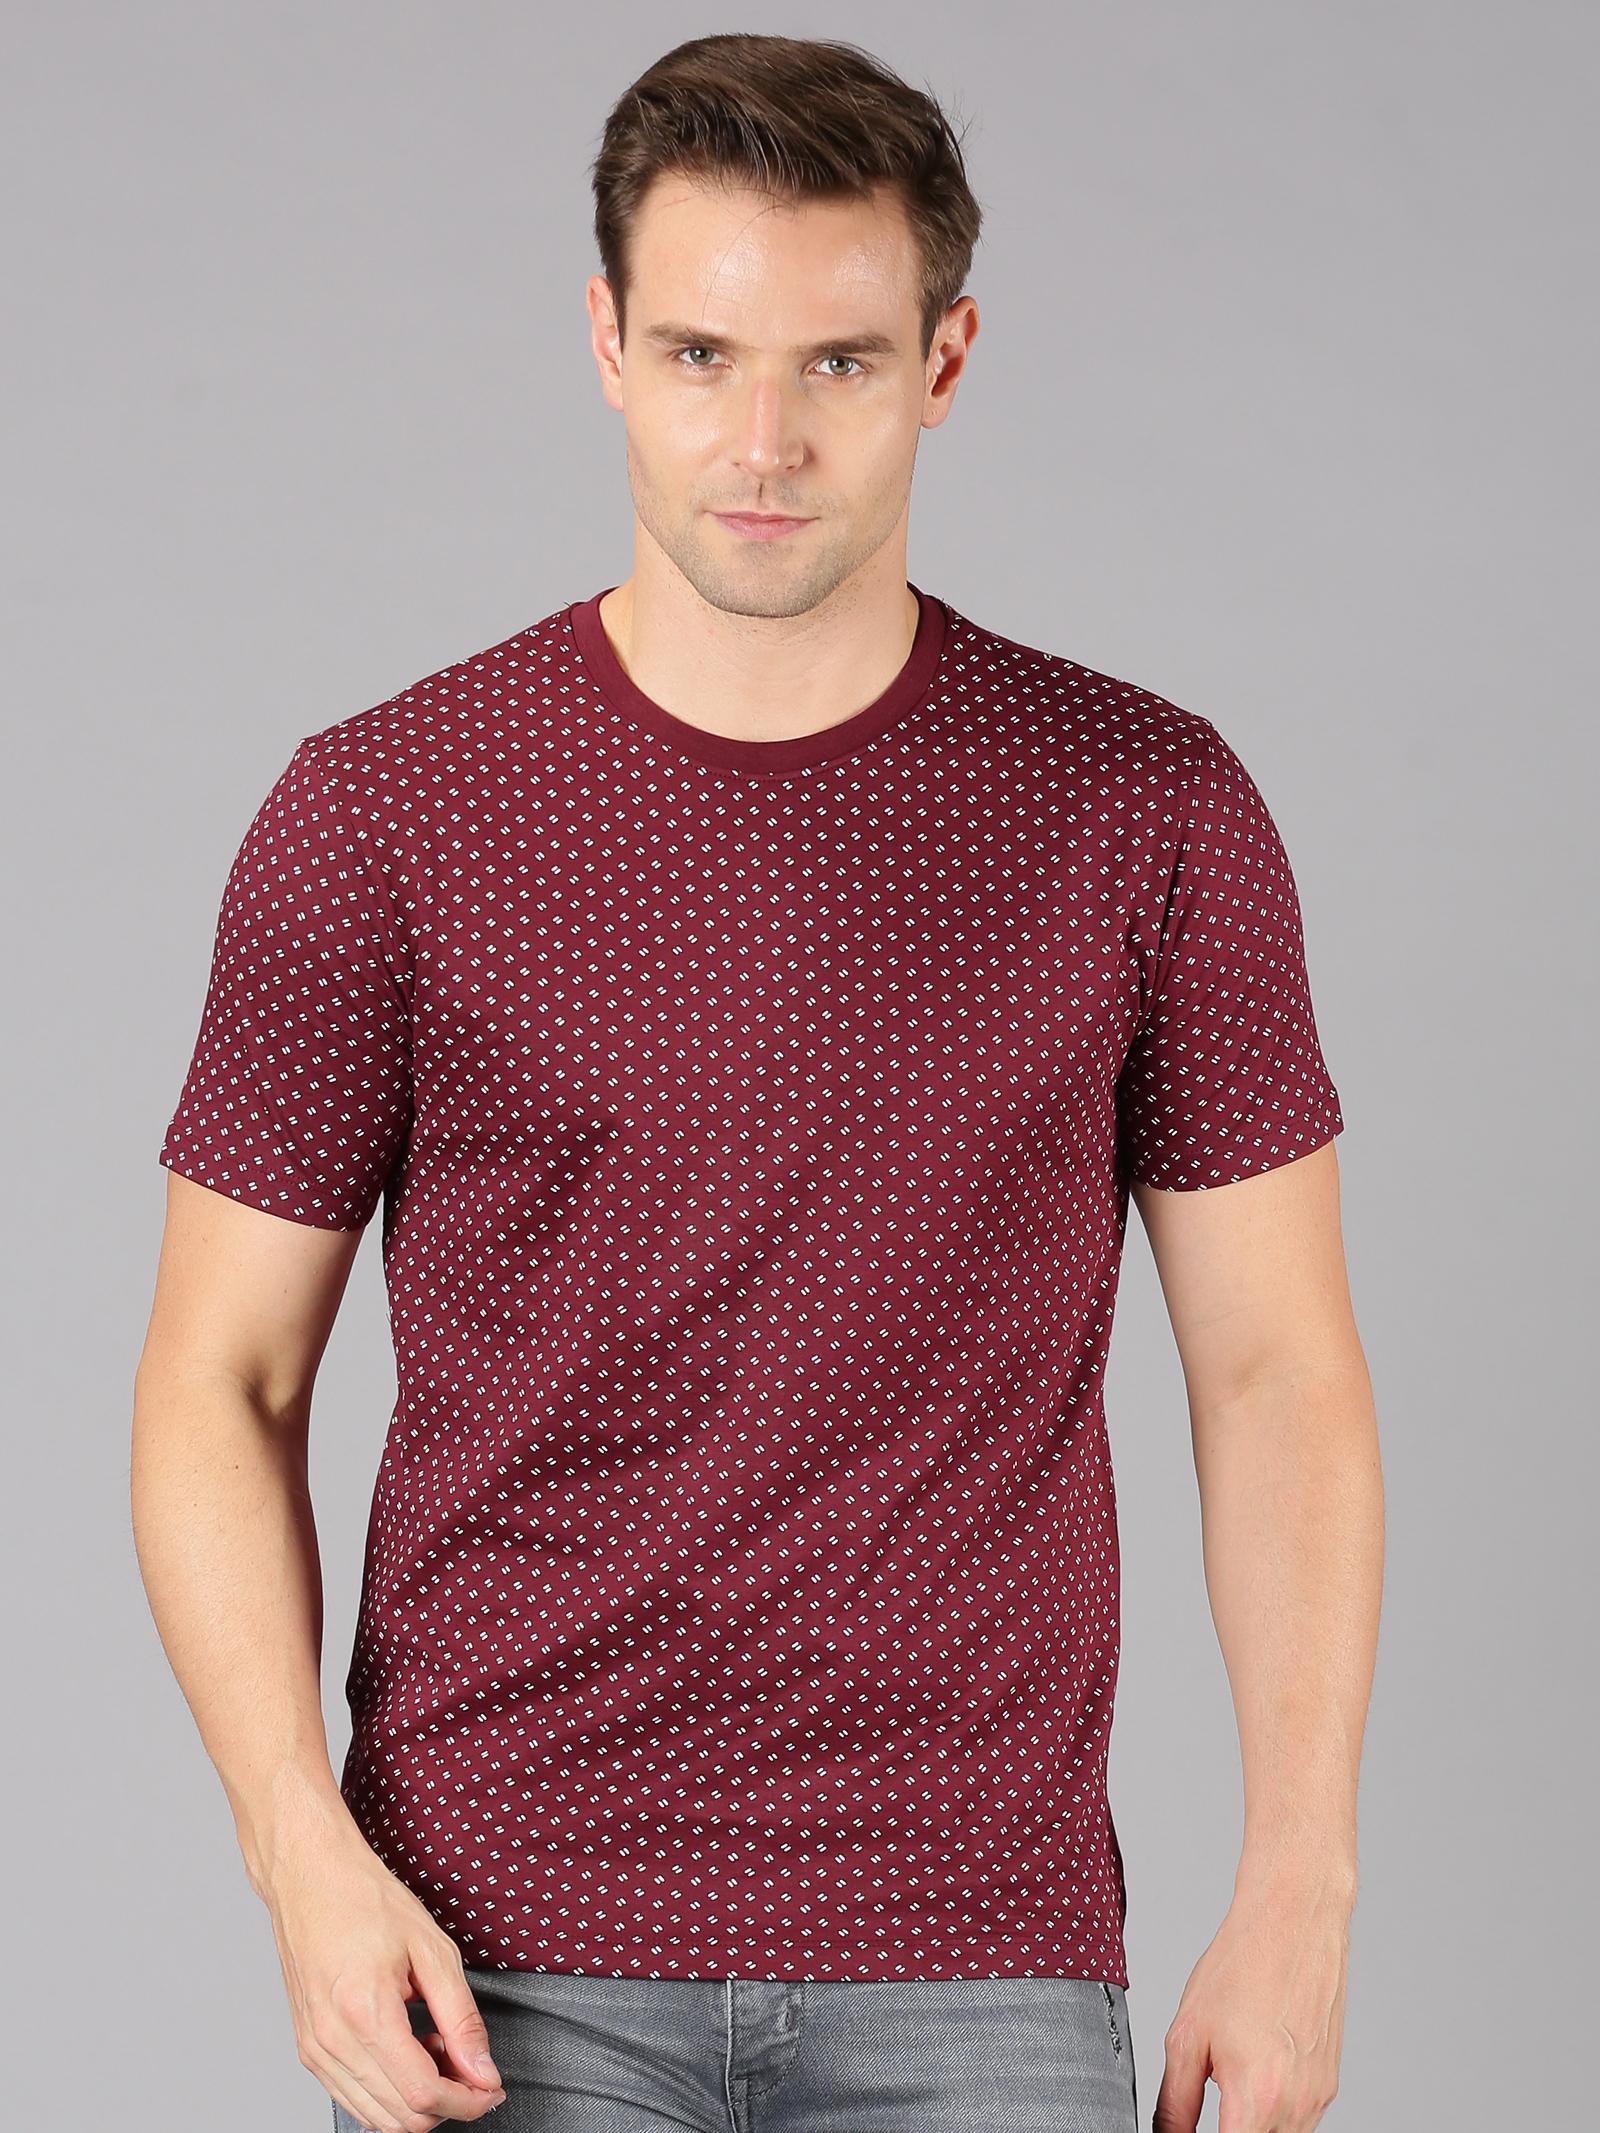 UrGear   UrGear Printed Men Round Neck Maroon T-Shirt